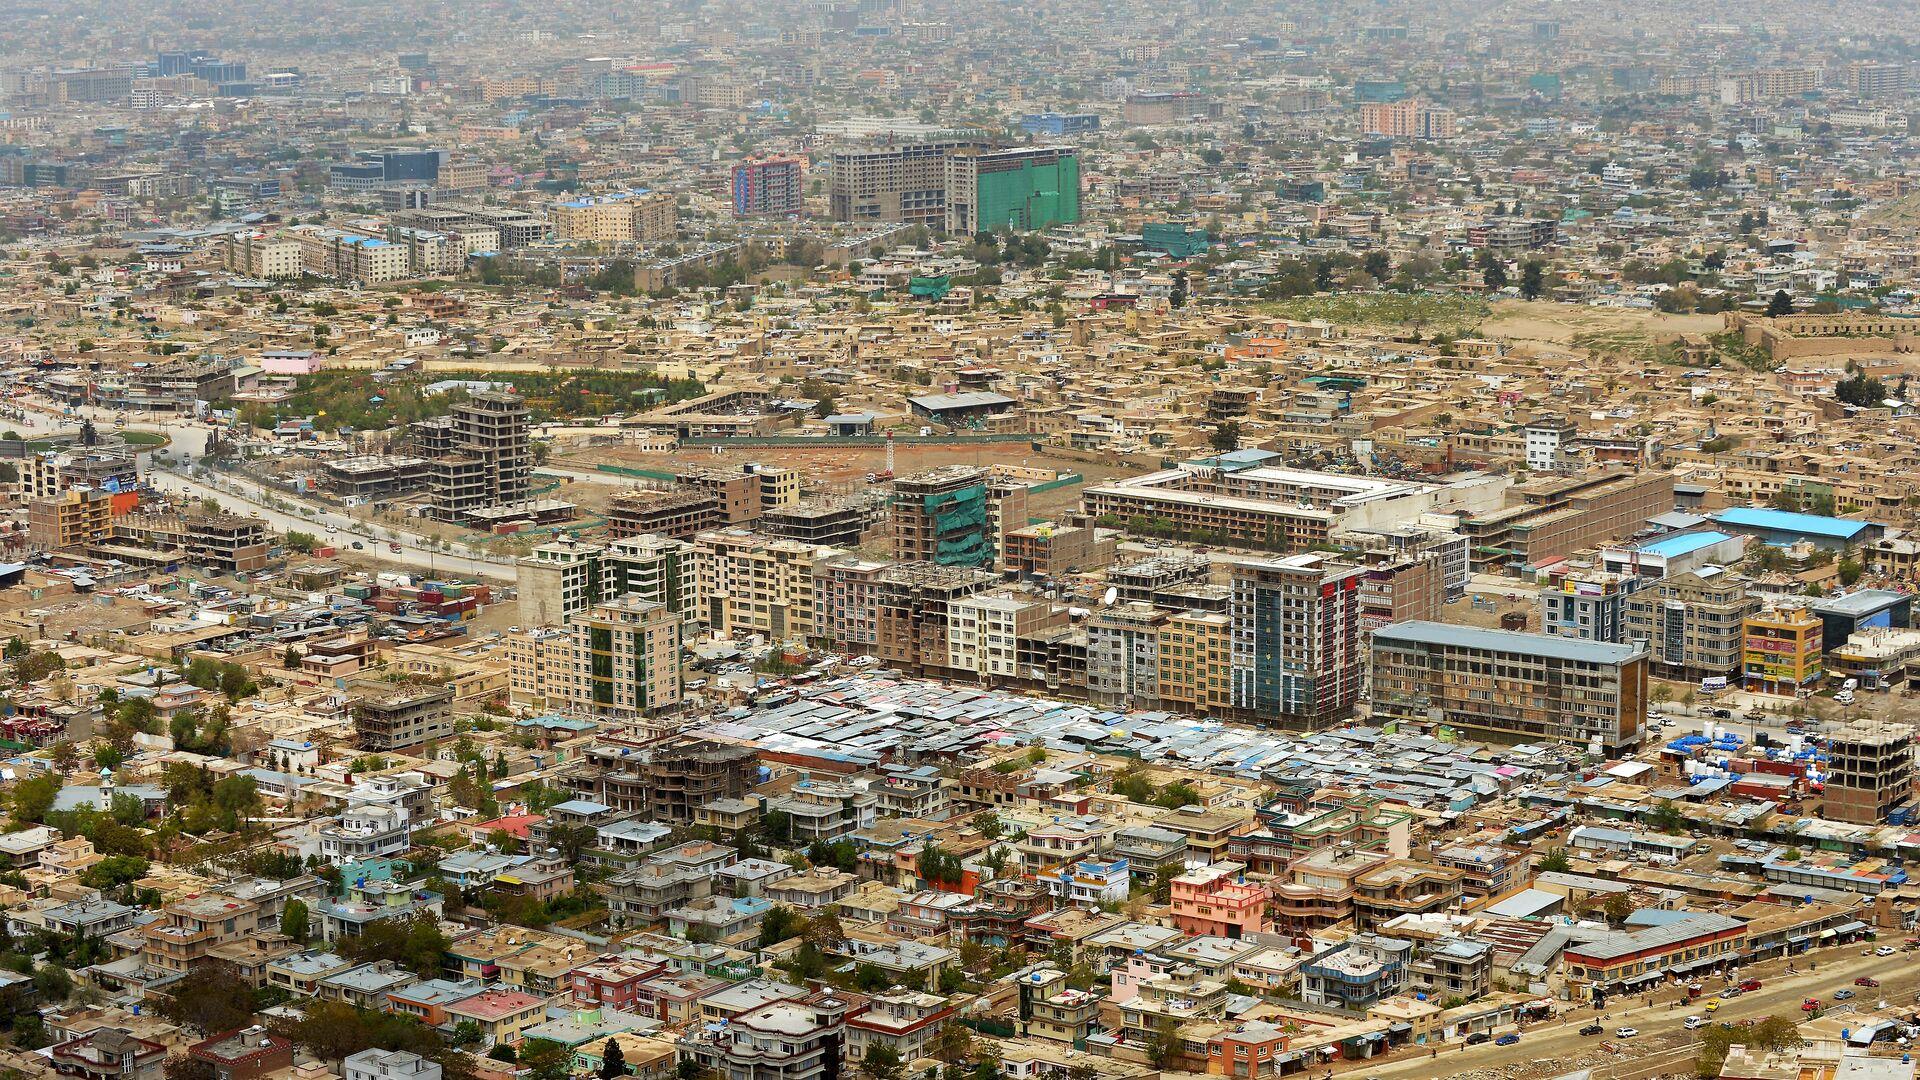 Kabul, la capital de Afganistán (archivo) - Sputnik Mundo, 1920, 13.08.2021